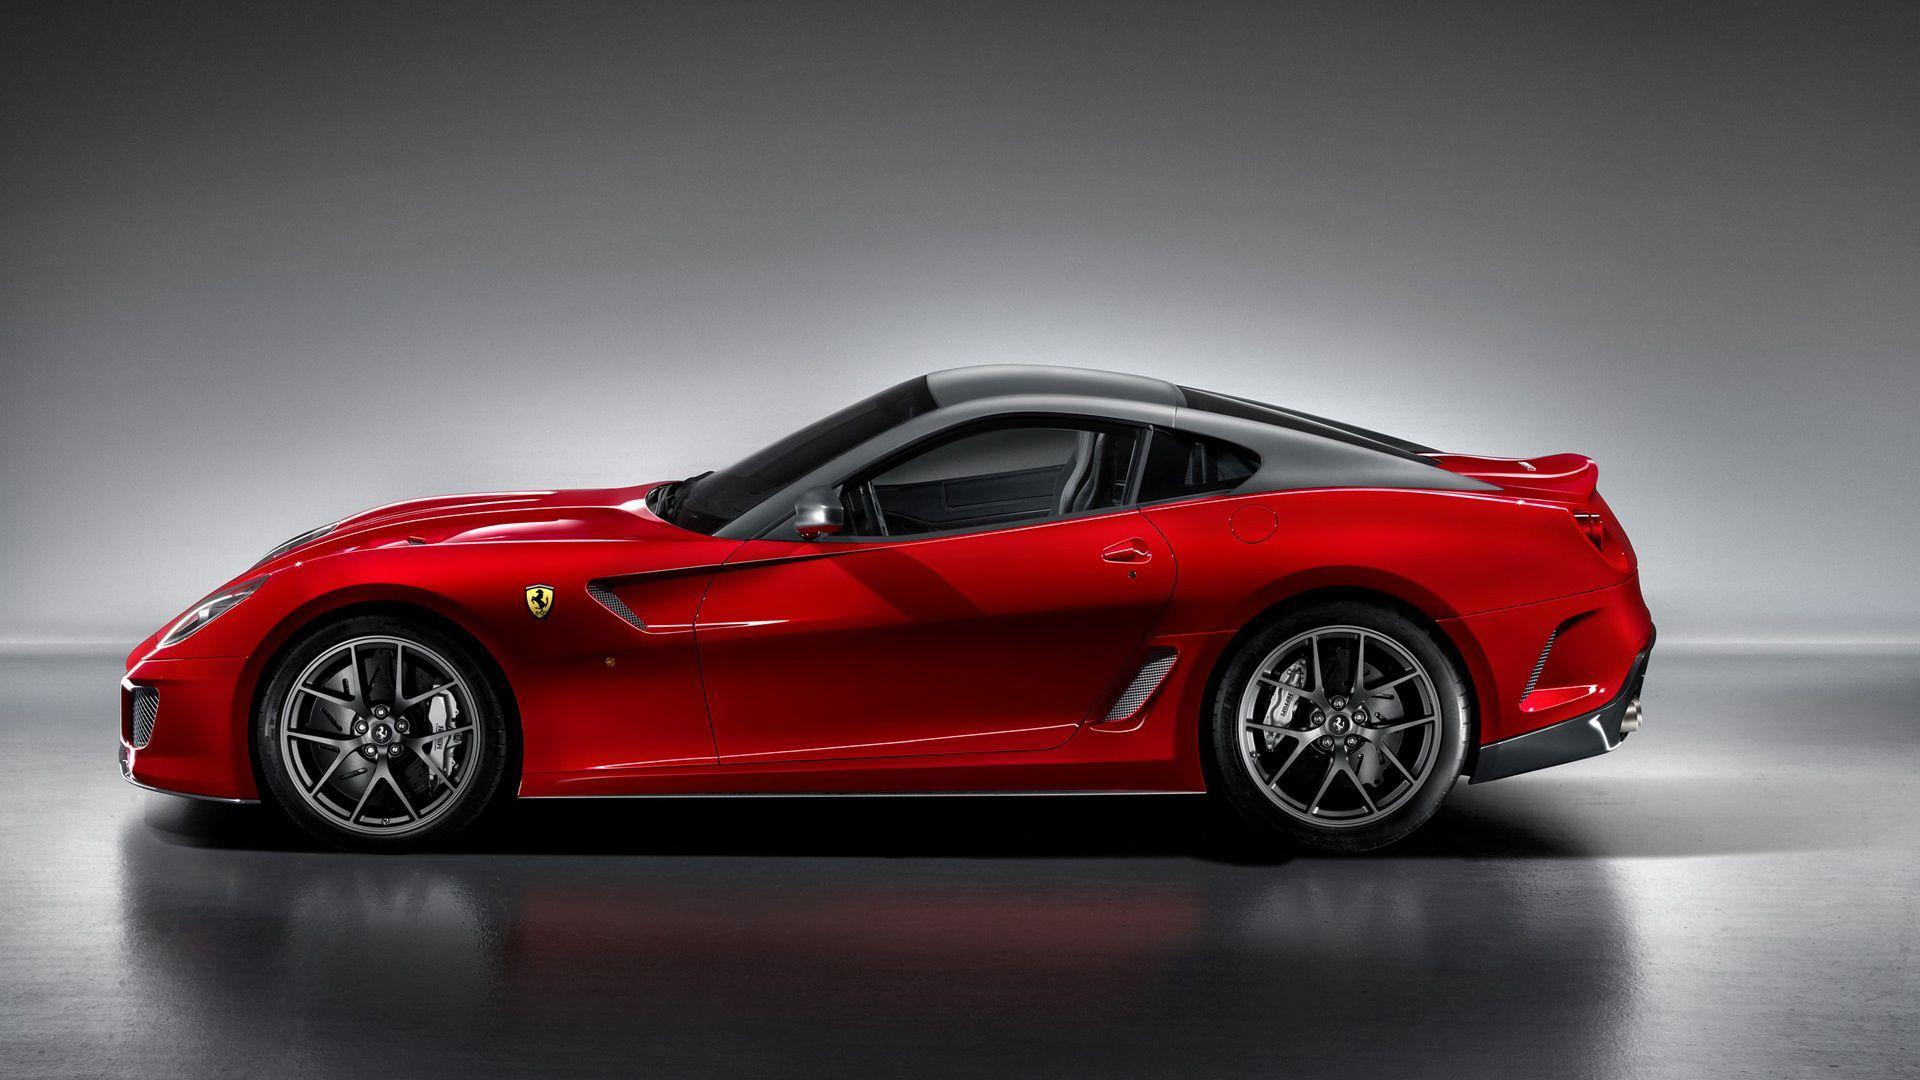 Ferrari 599 Wallpapers Top Free Ferrari 599 Backgrounds Wallpaperaccess